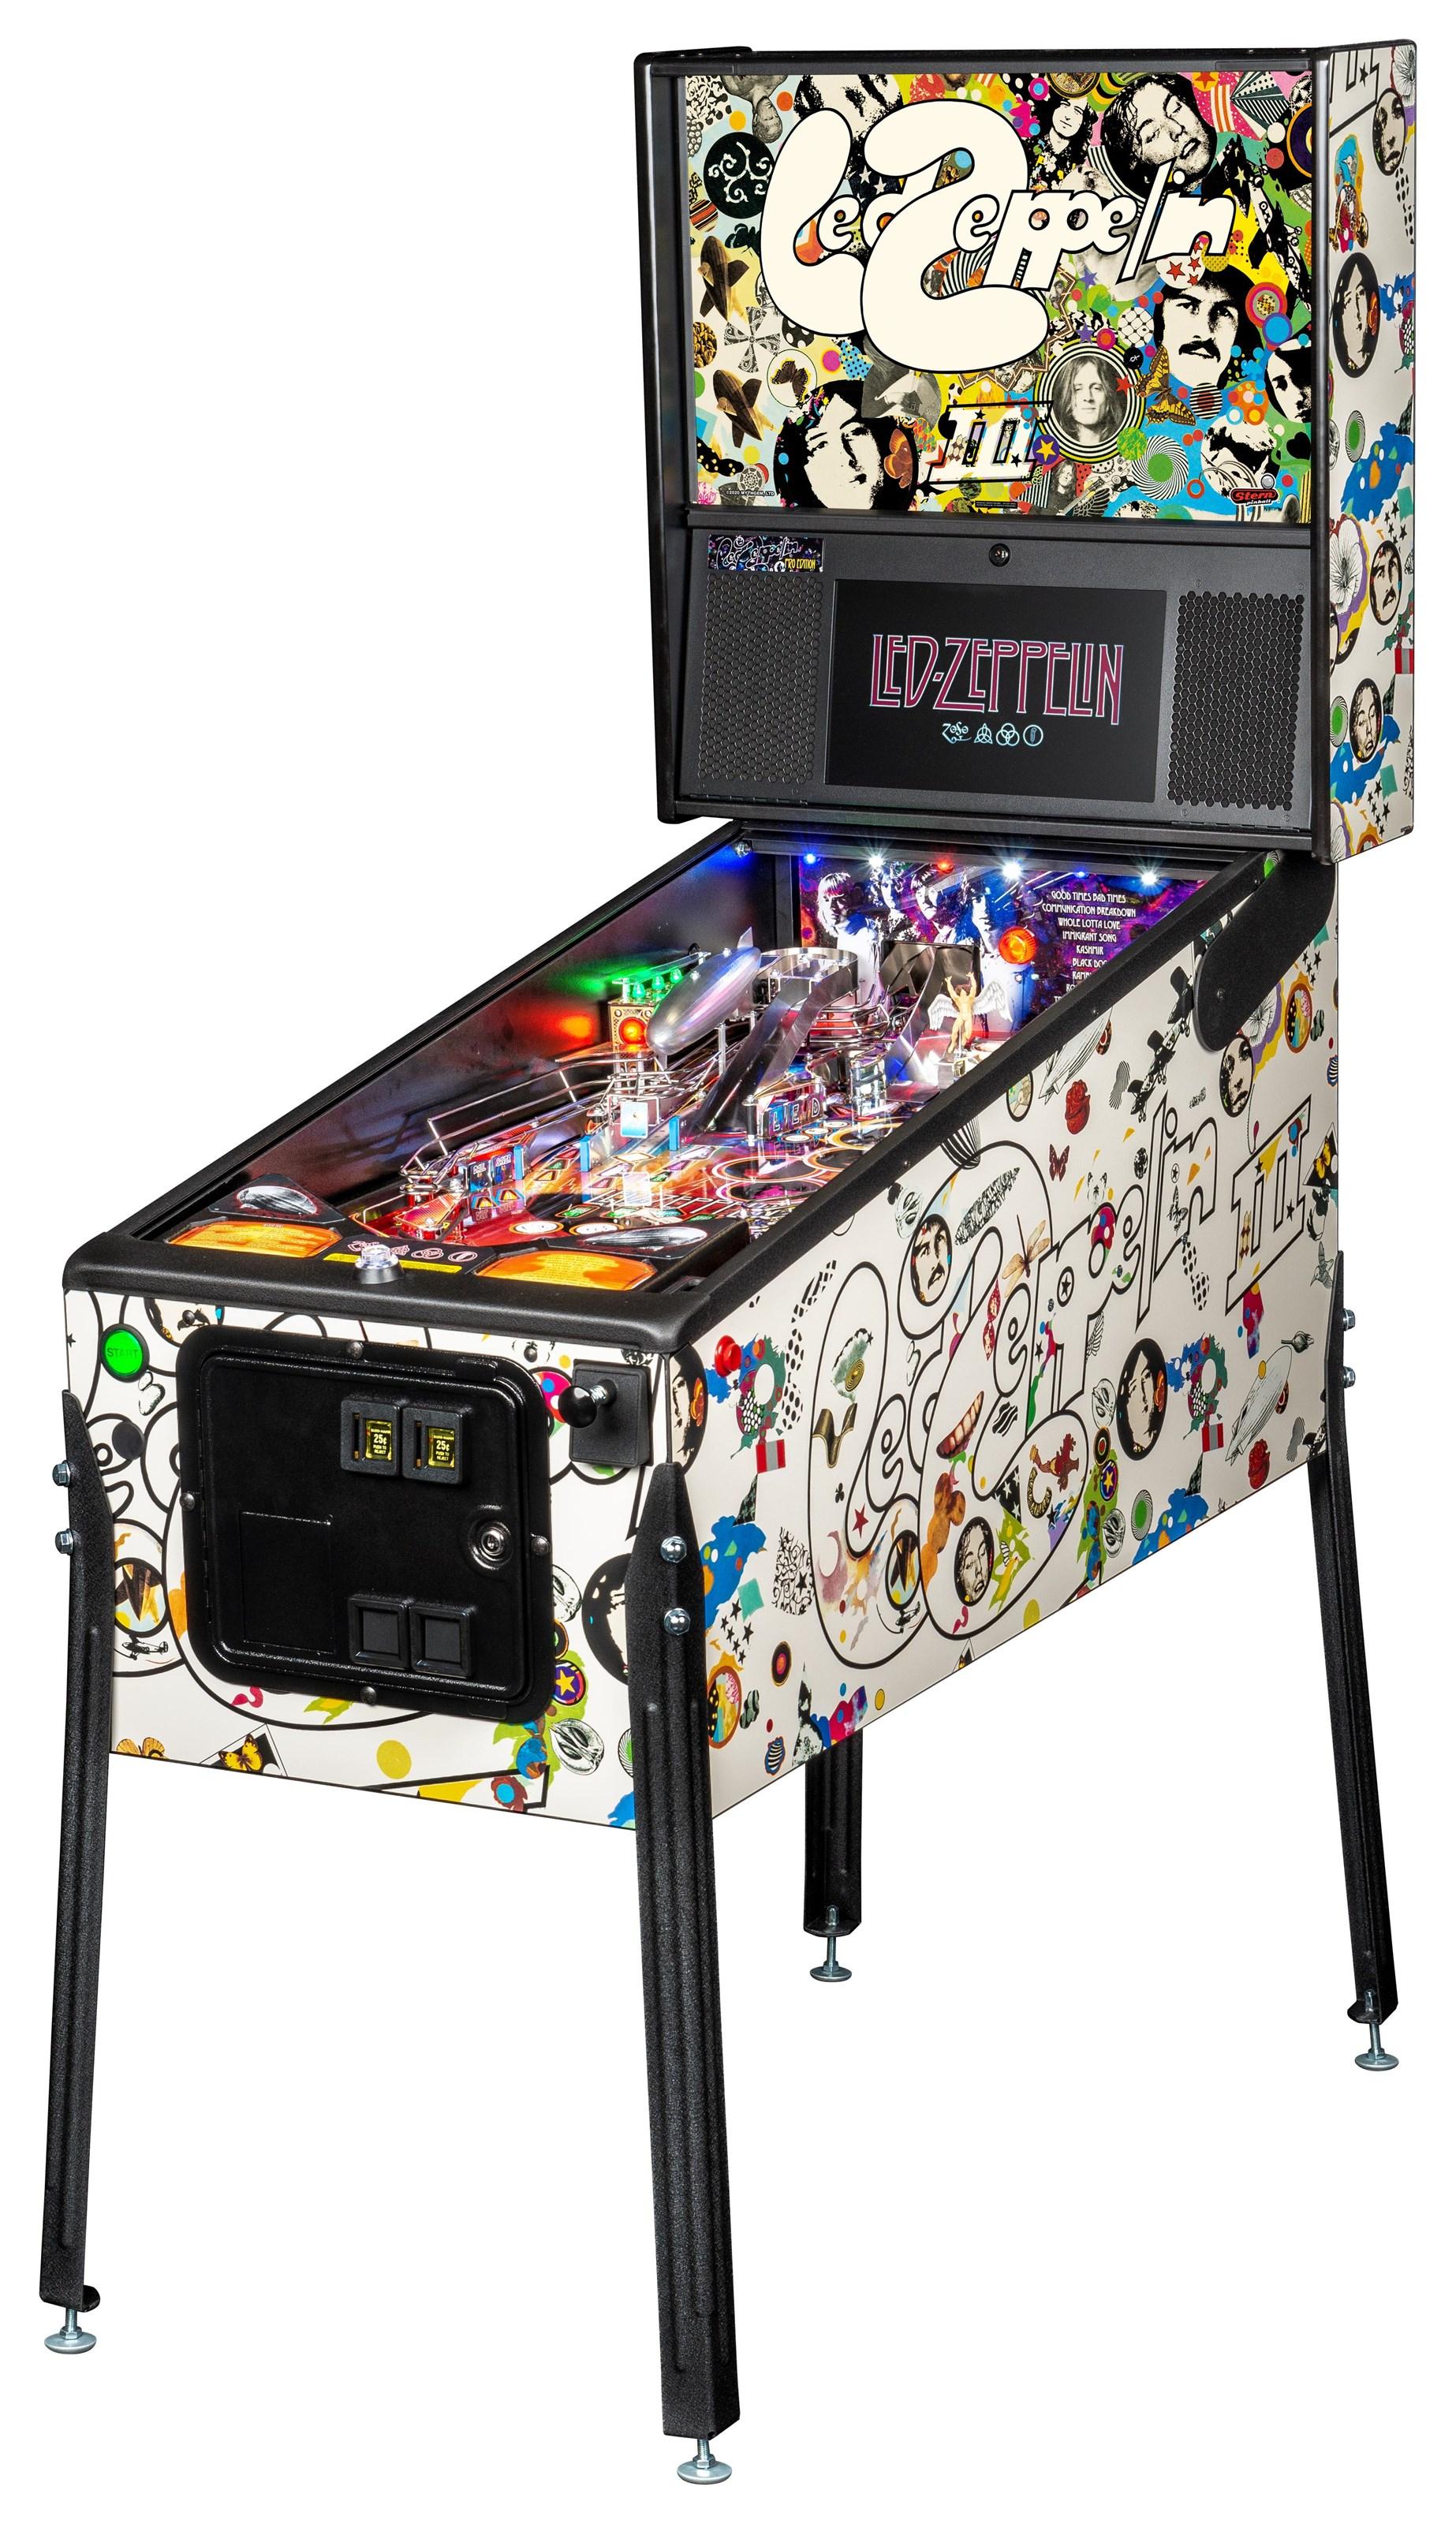 Games Led Zepplin Pinball Machine by Stern Pinball at Johnny Janosik